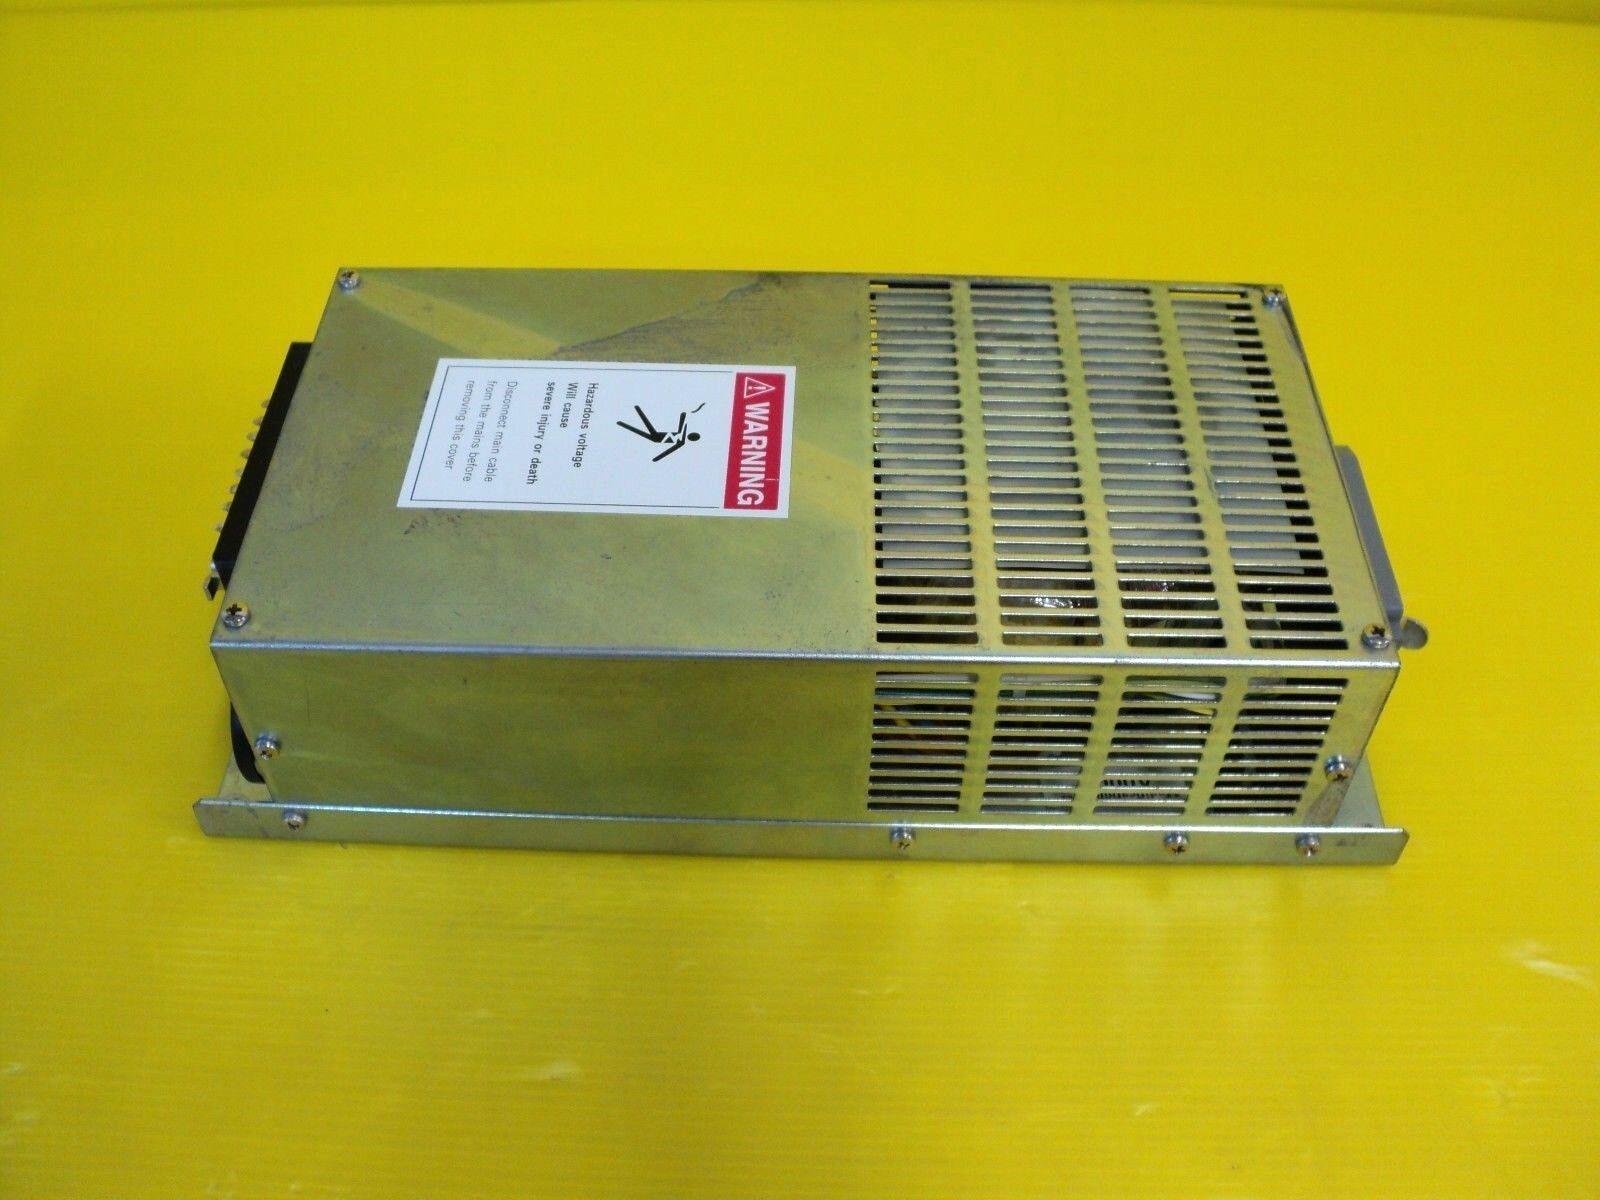 VARIAN Turbo-V 250 C.U. 9699504S011 70411535000